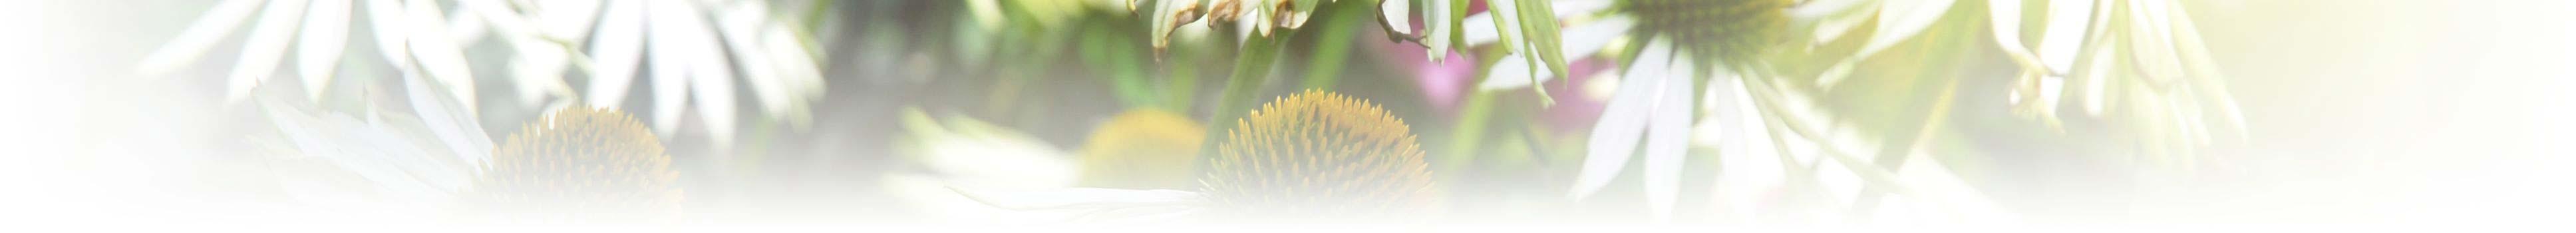 naturopathy-fade